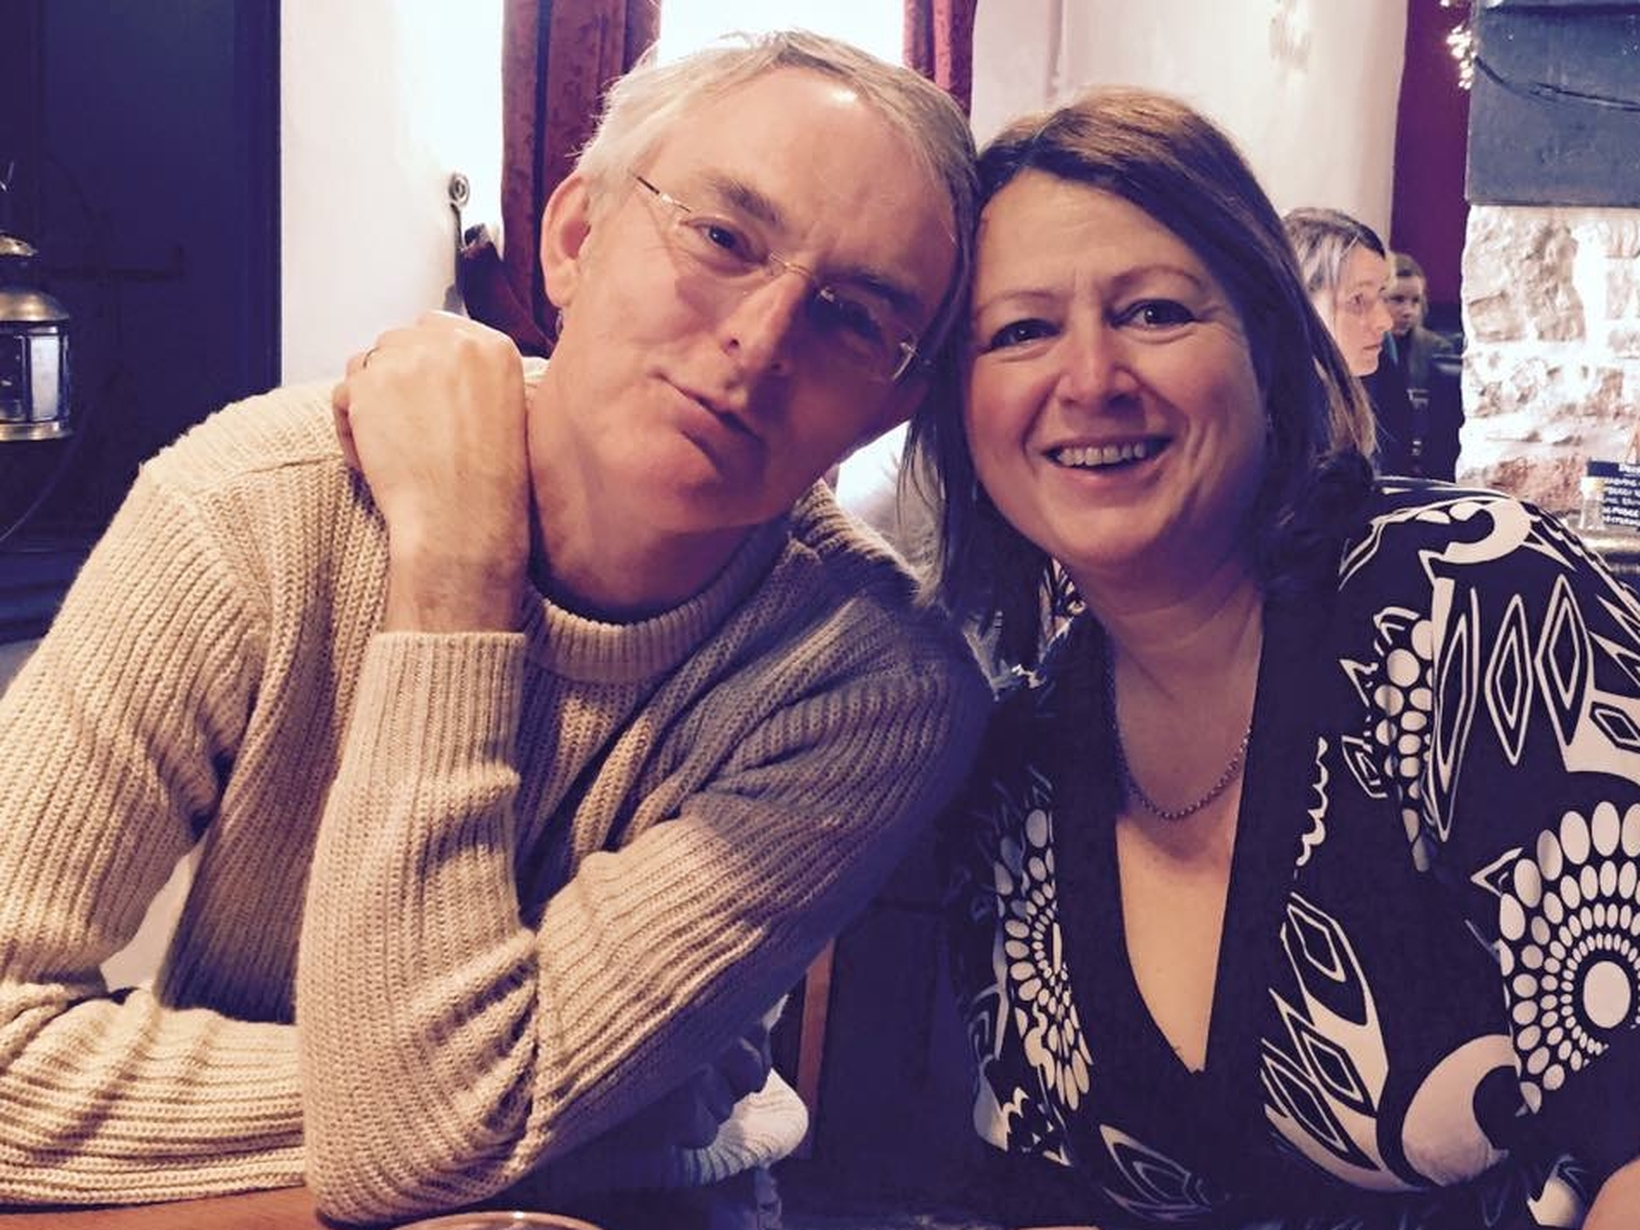 Lesley & Martyn from Rogiet, United Kingdom